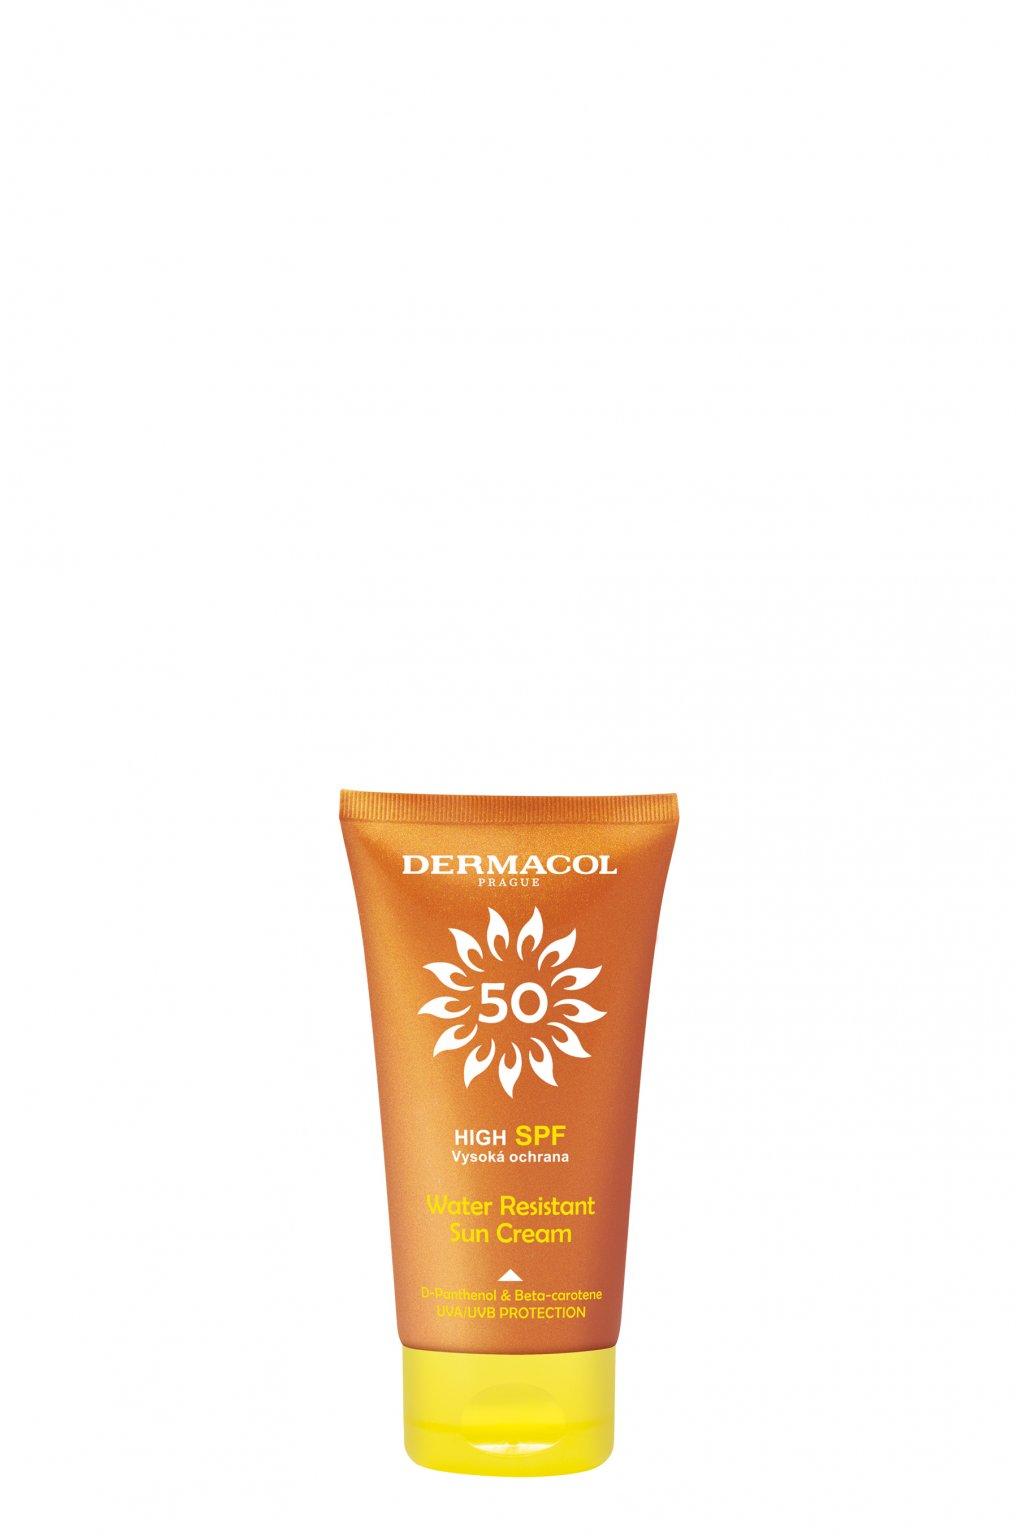 dermacol sun water resistant pletovy krem na opalovani spf 50